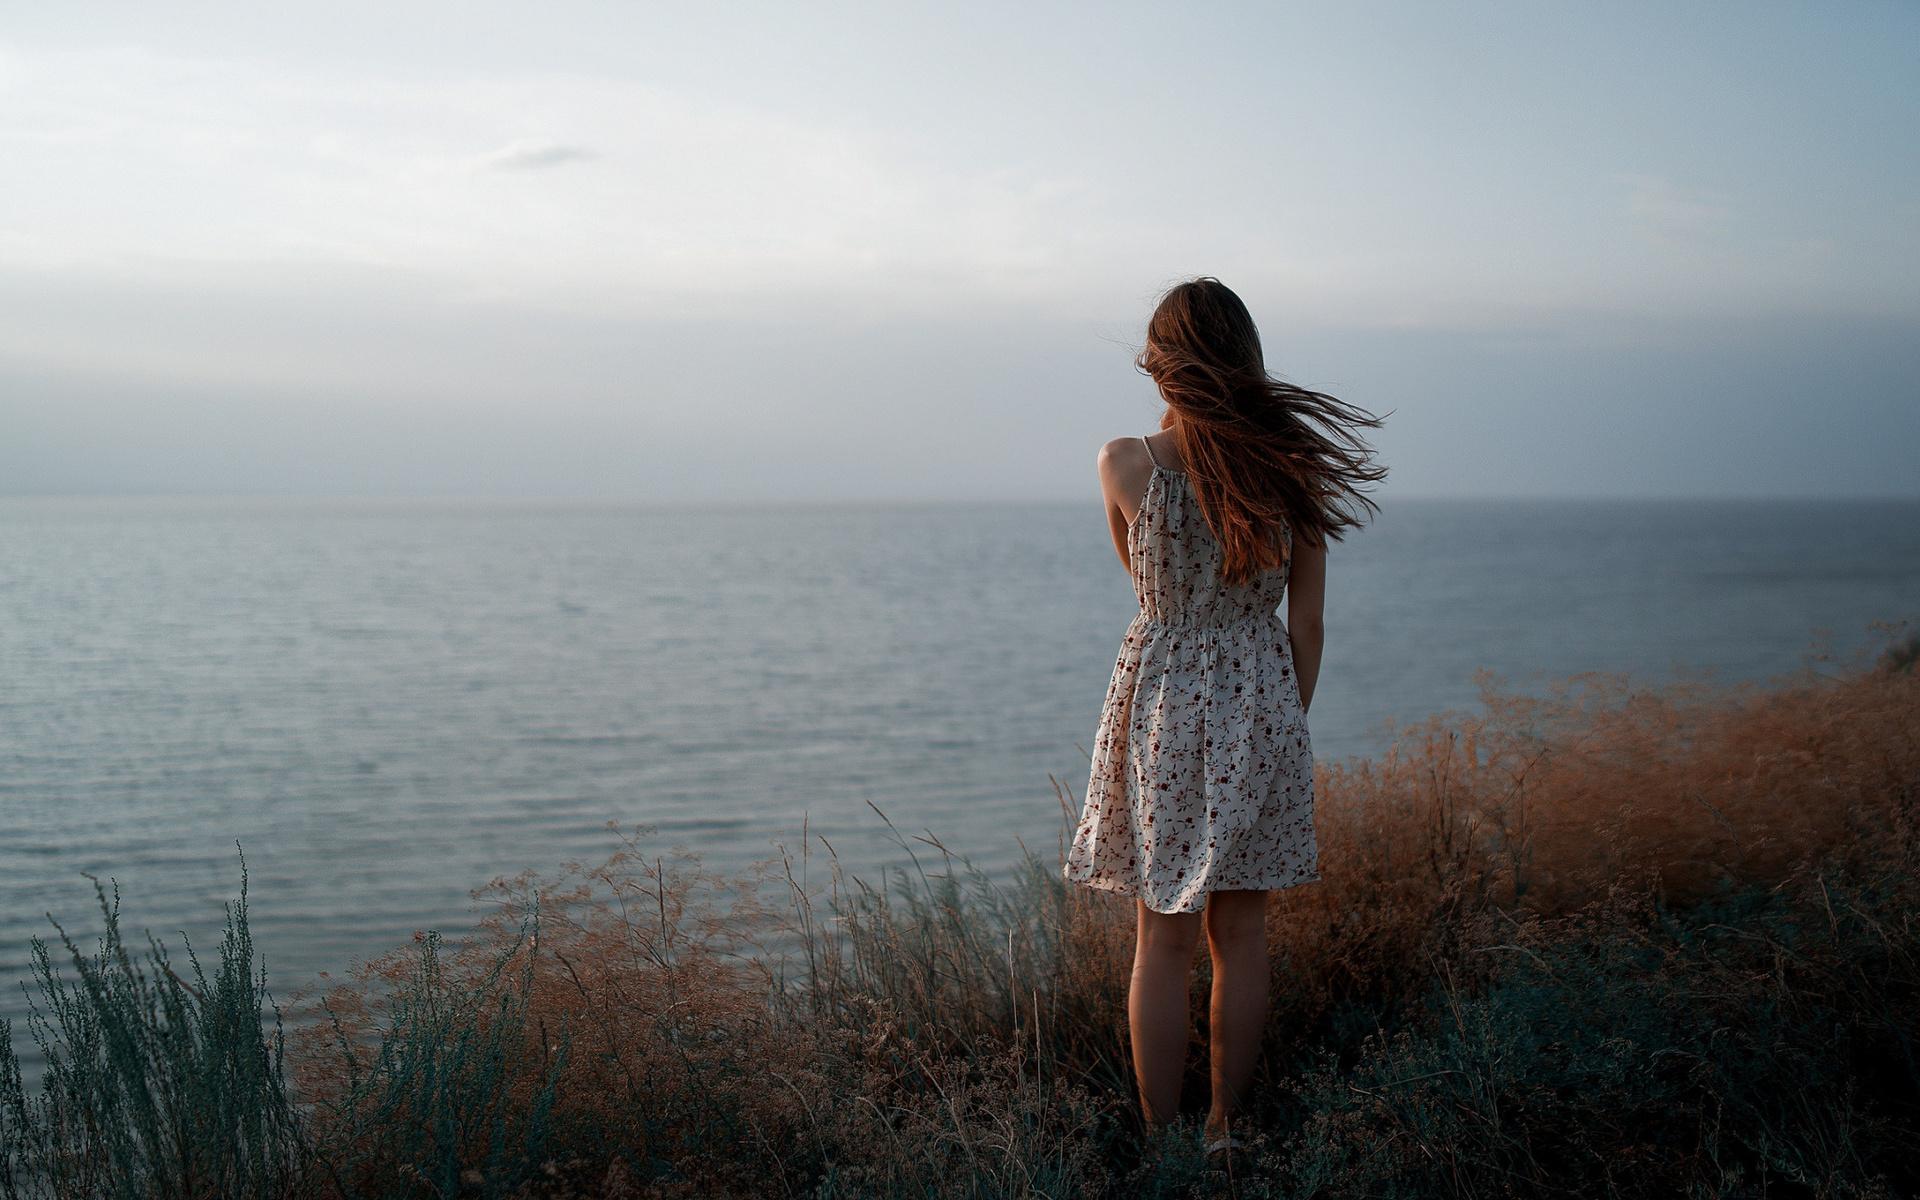 девушка, платье, ветер, антон фреймз